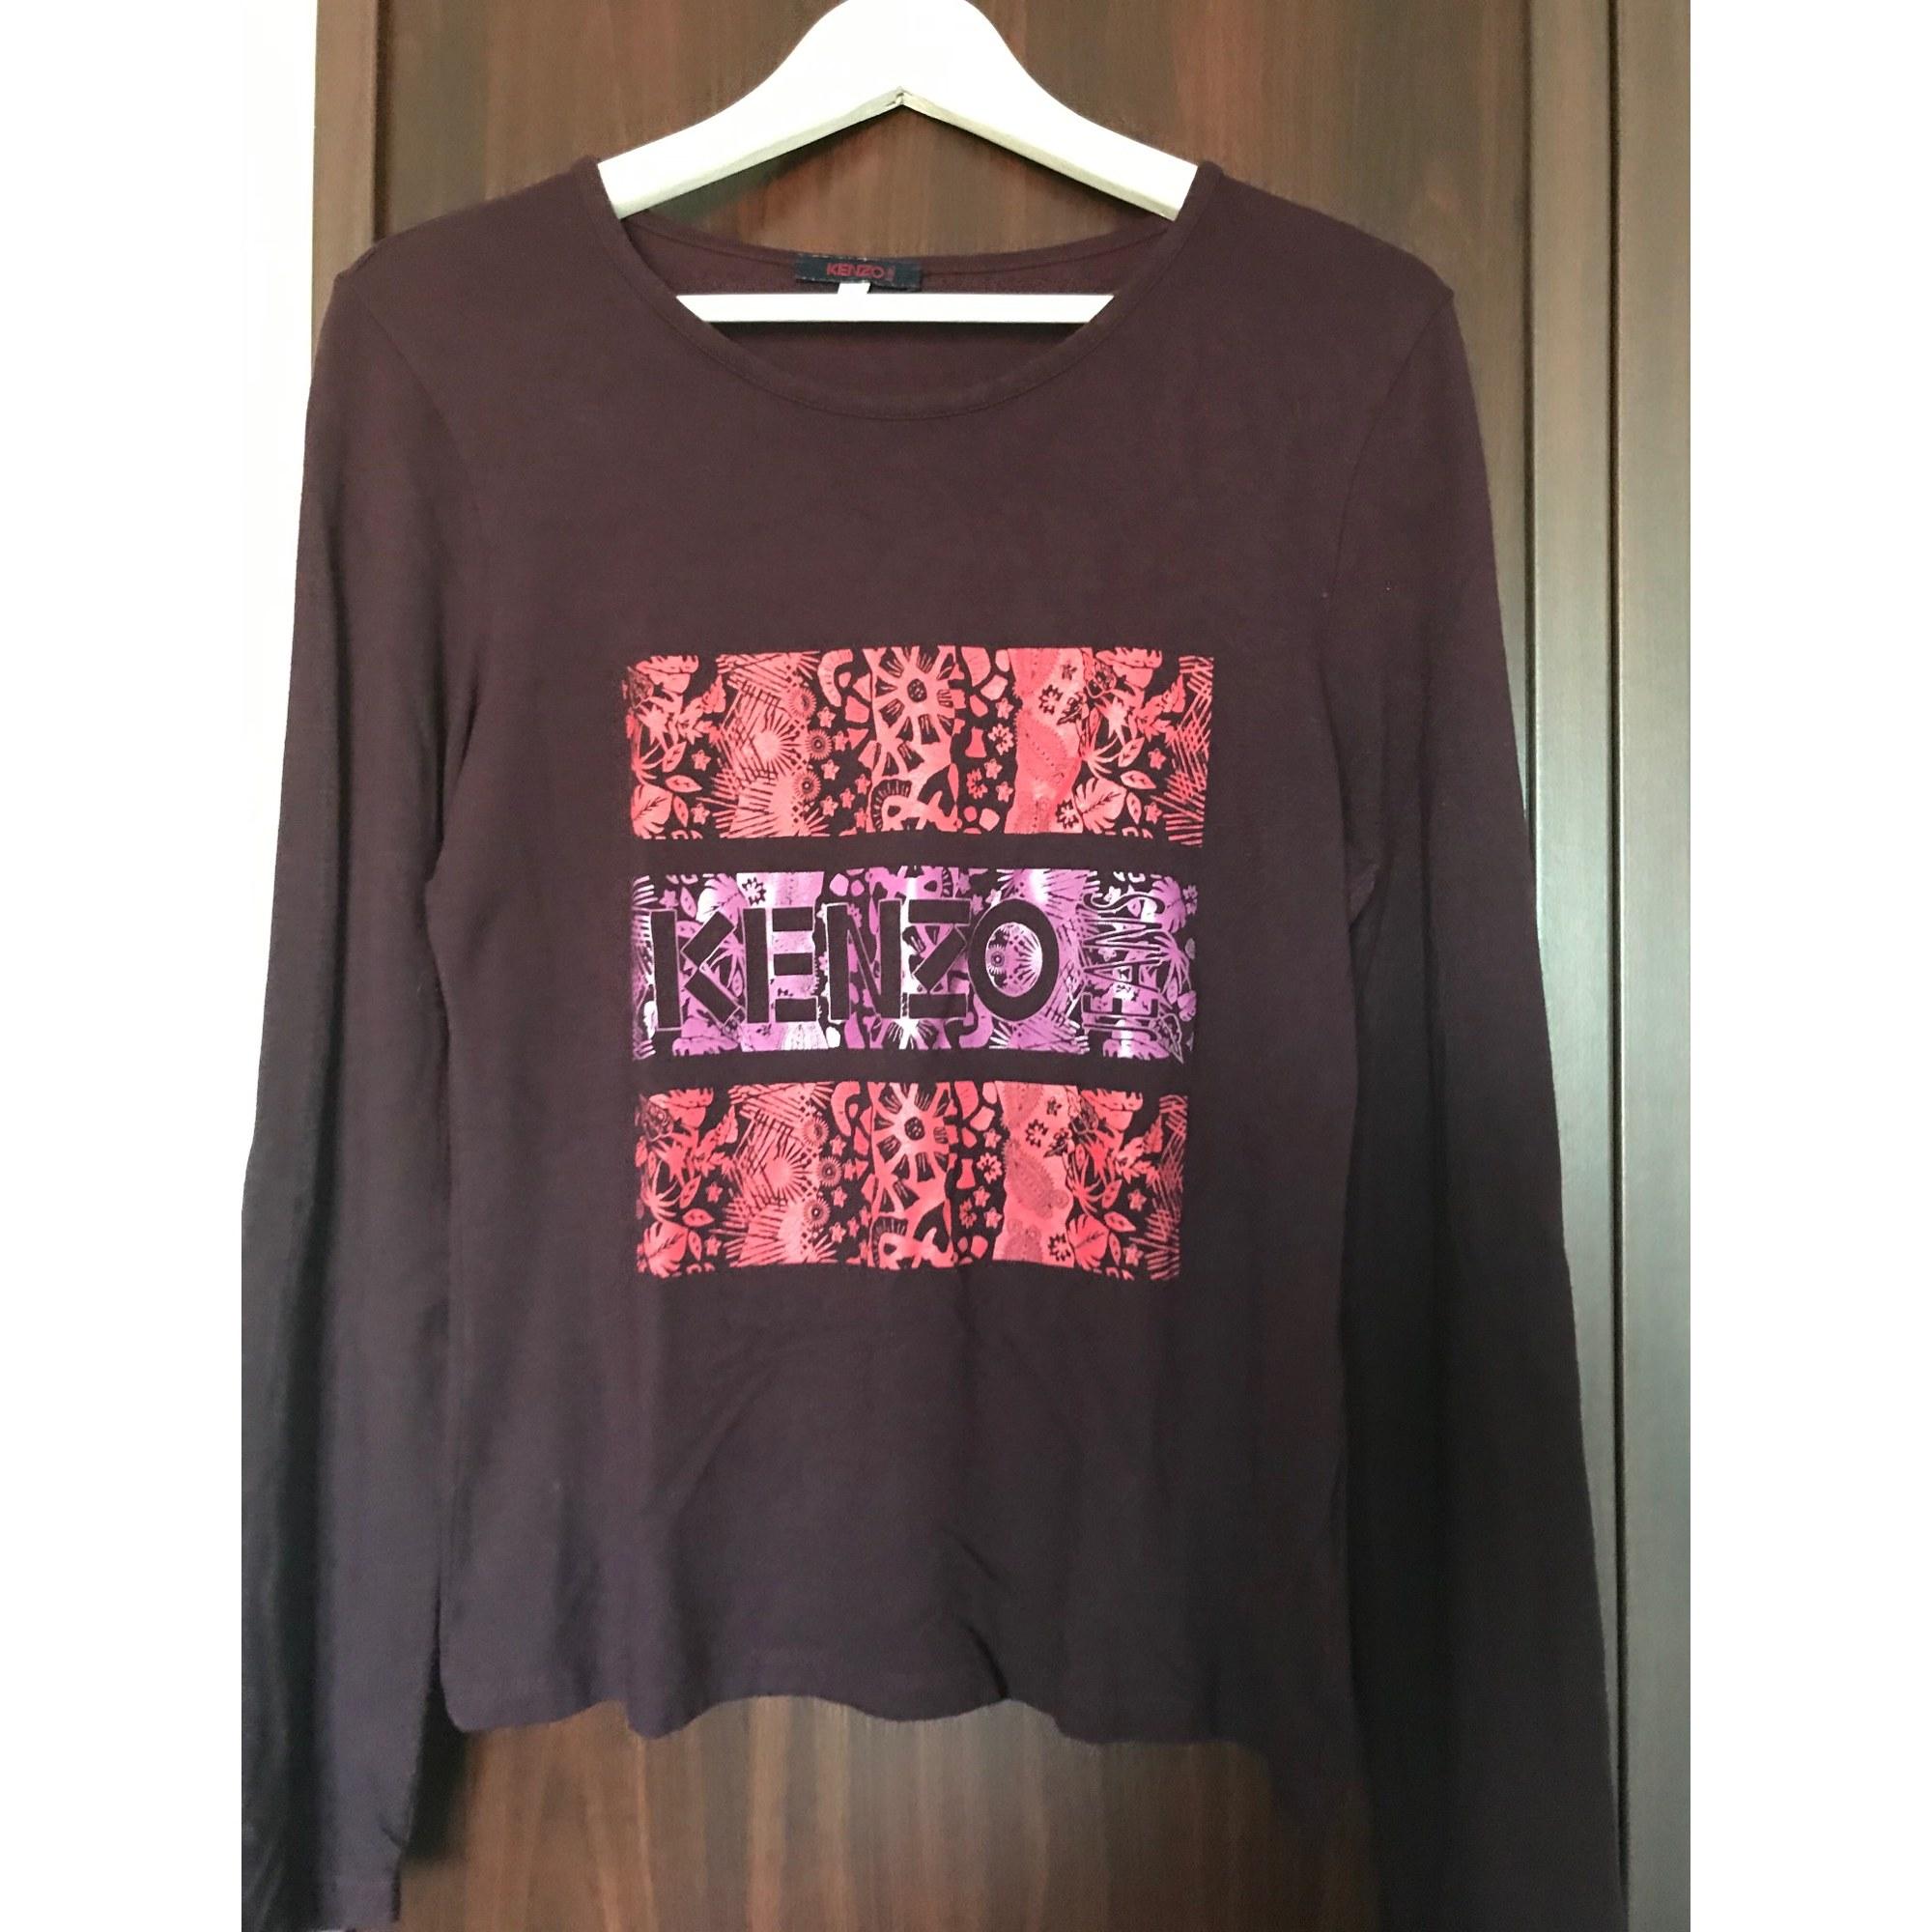 Top, tee-shirt KENZO Rouge, bordeaux